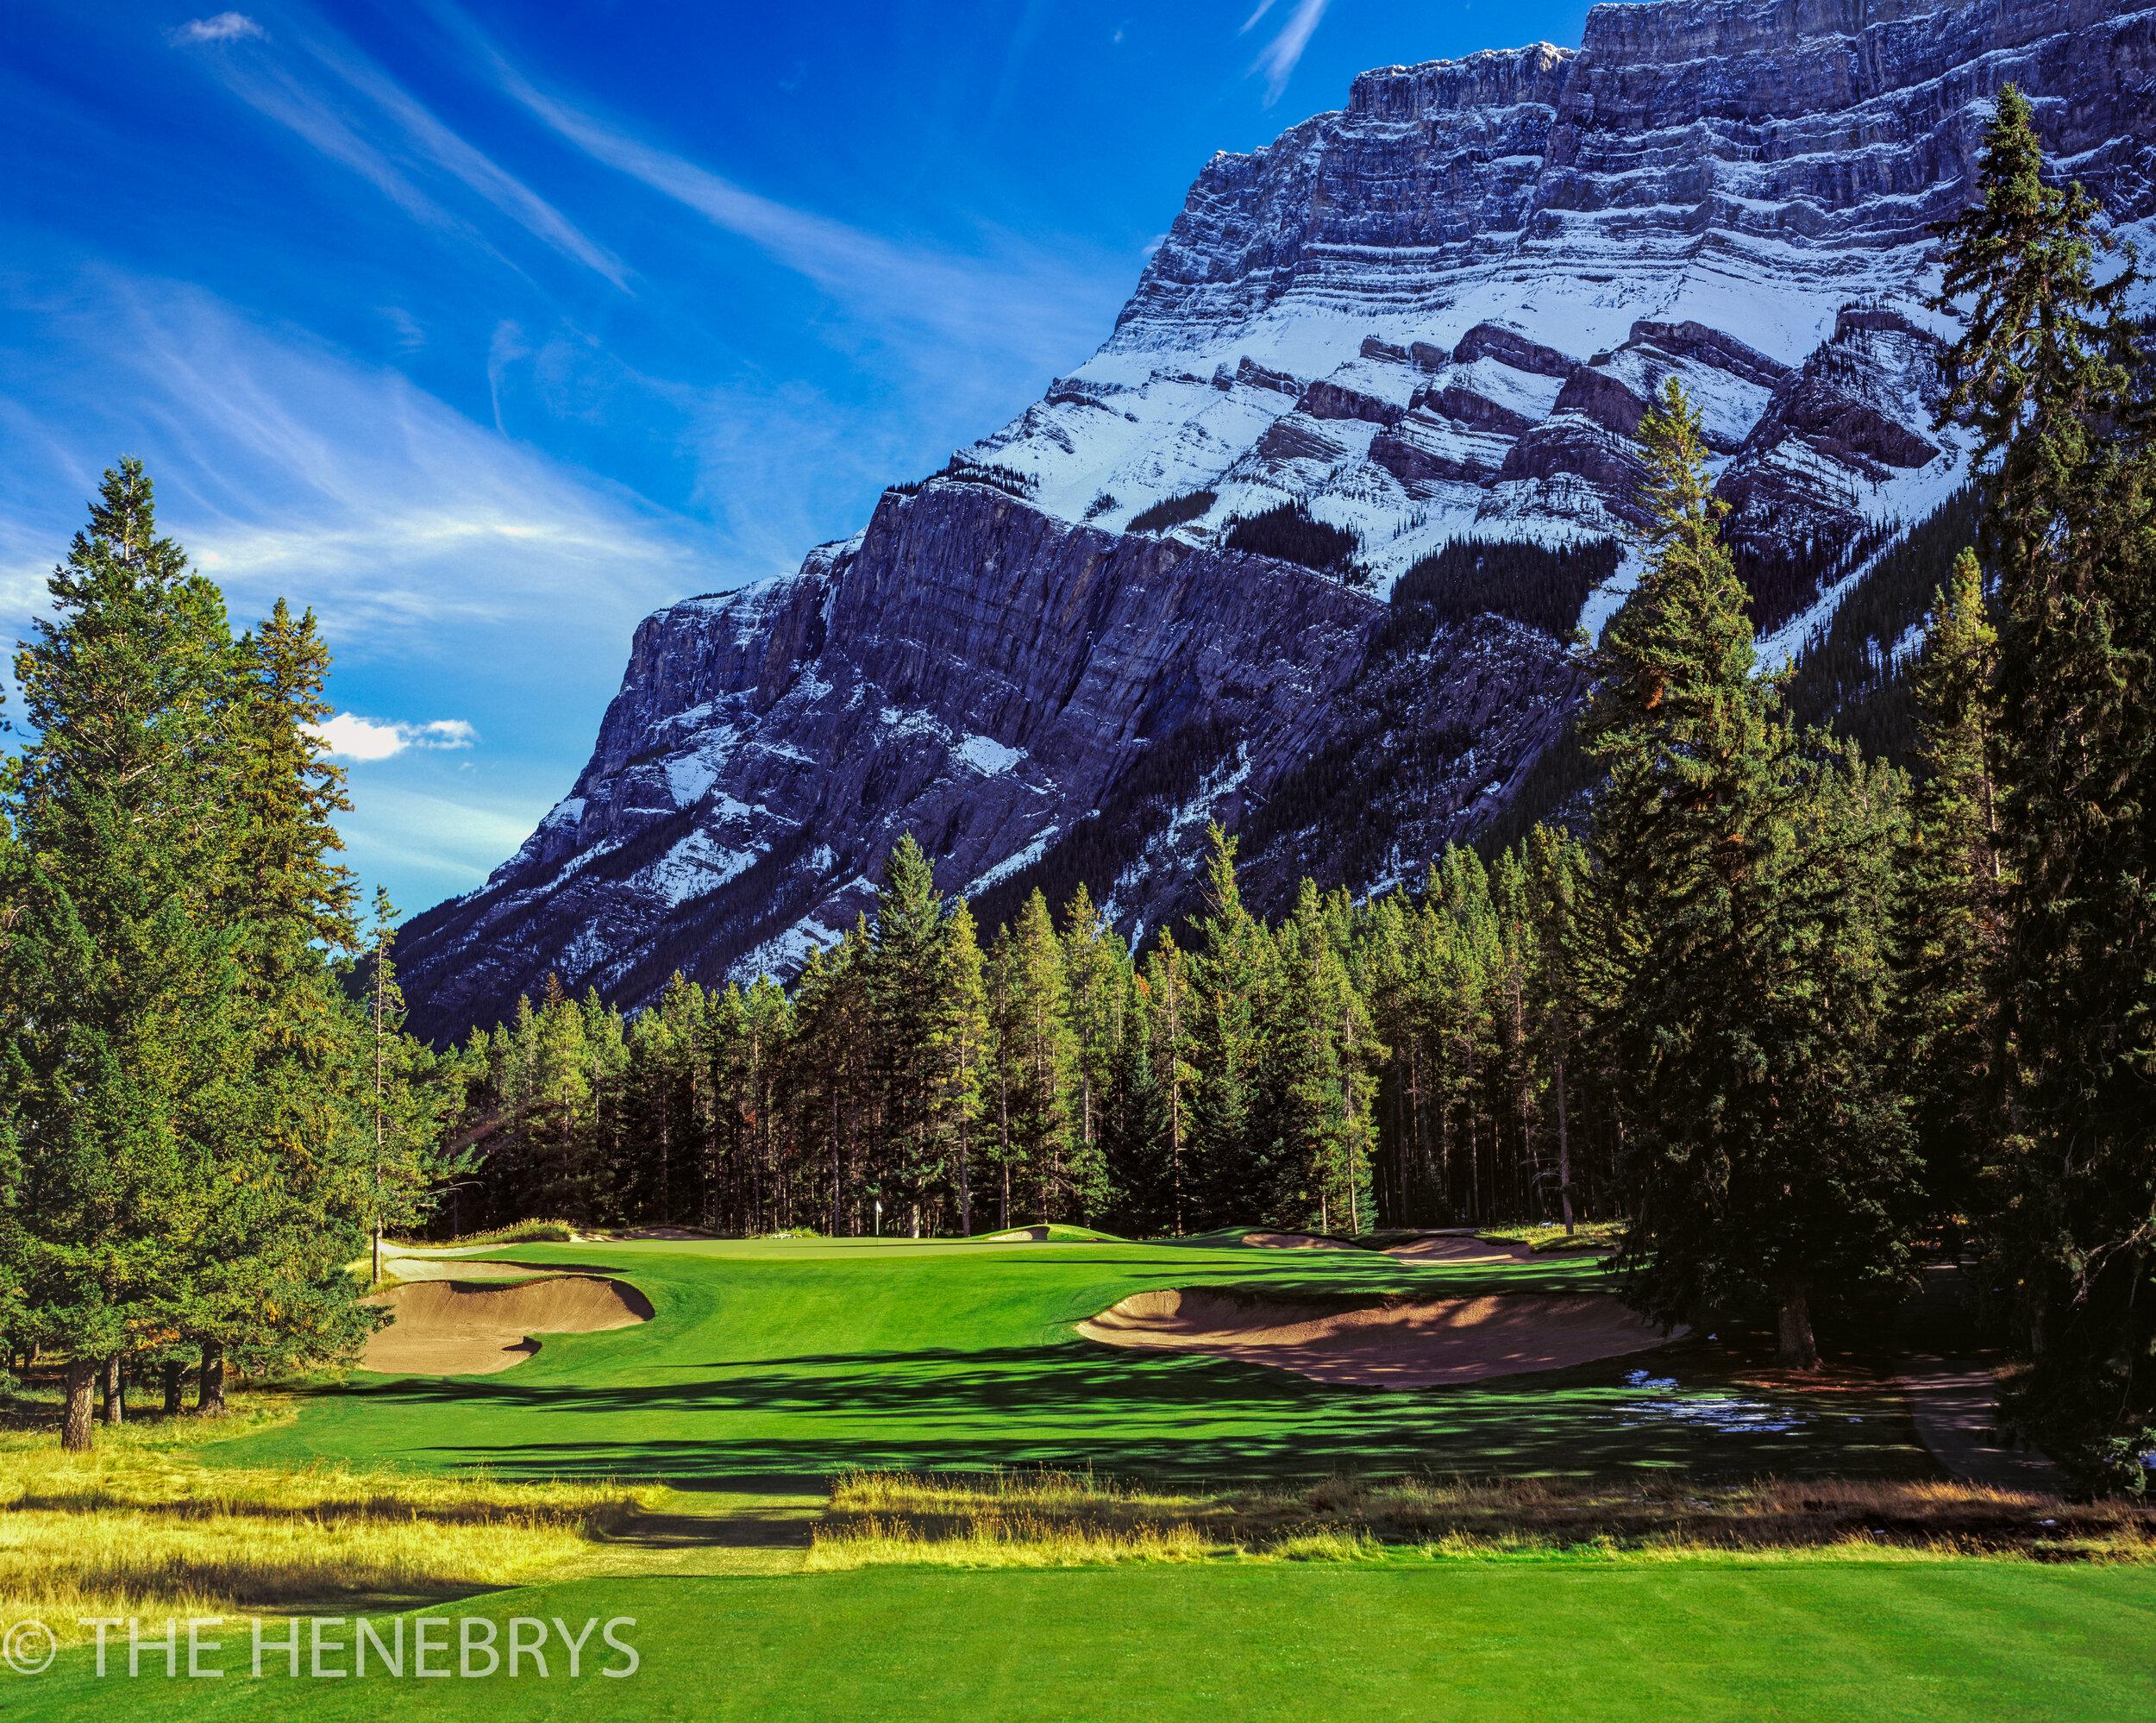 Fairmont Banff Springs Golf Course, Stanley Thompson Course #02, Banff, Canada